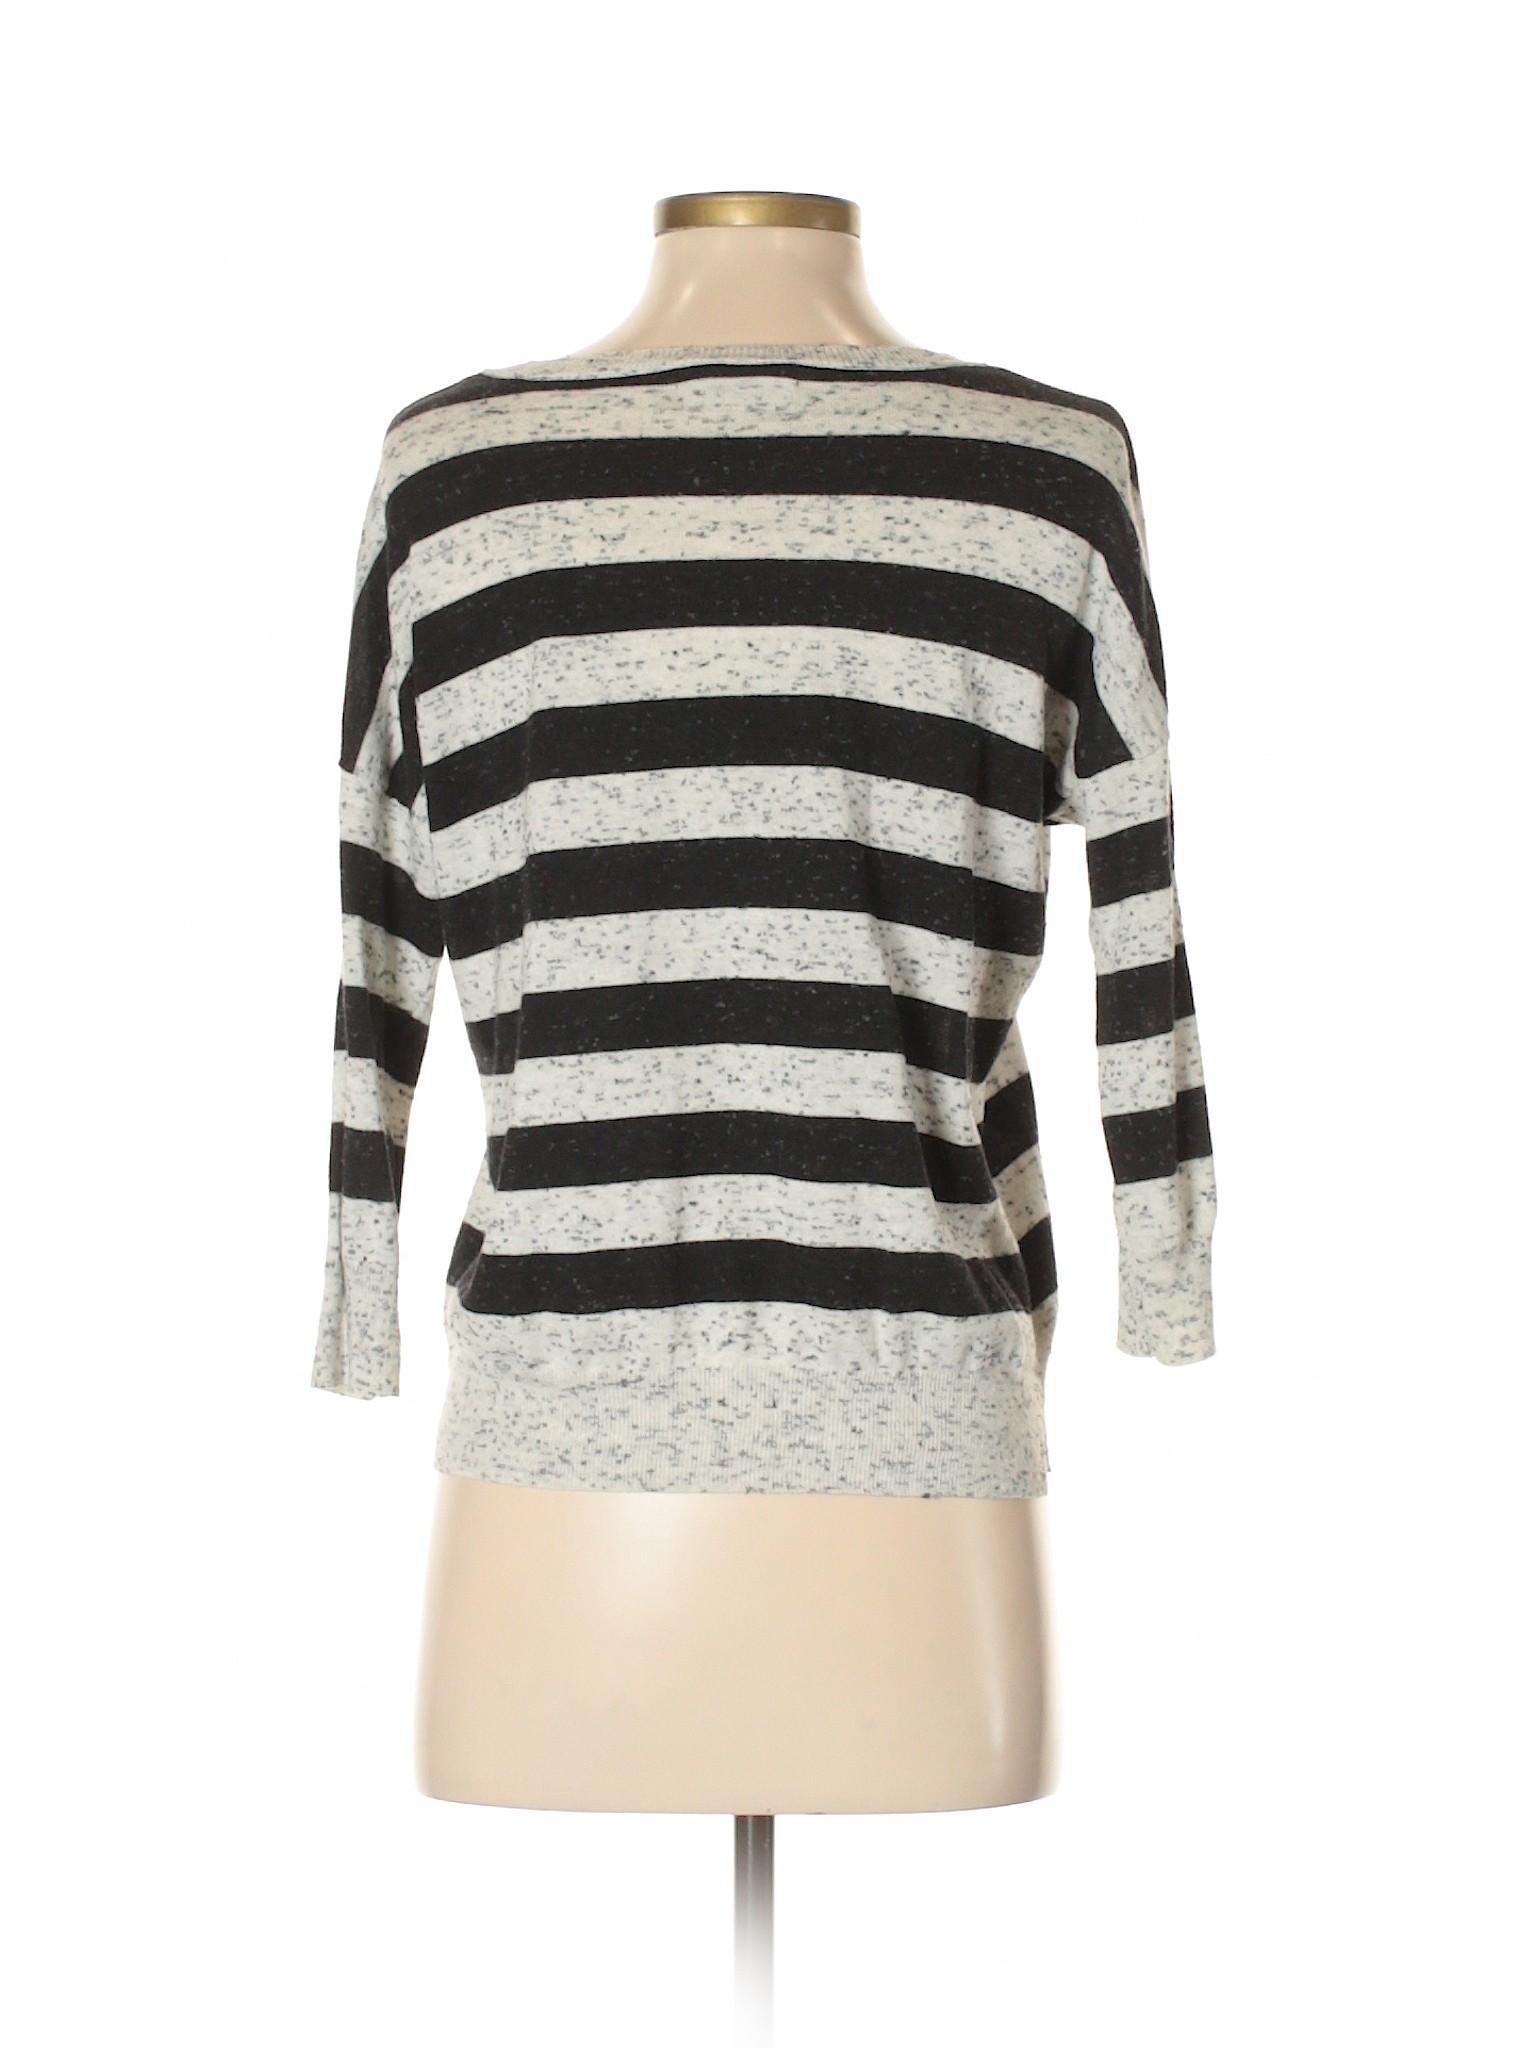 Sweater Boutique Pullover Boutique Pullover Sweater Gap Gap Pullover Sweater Boutique Boutique Gap Pullover Gap dxYwvqU6Hd